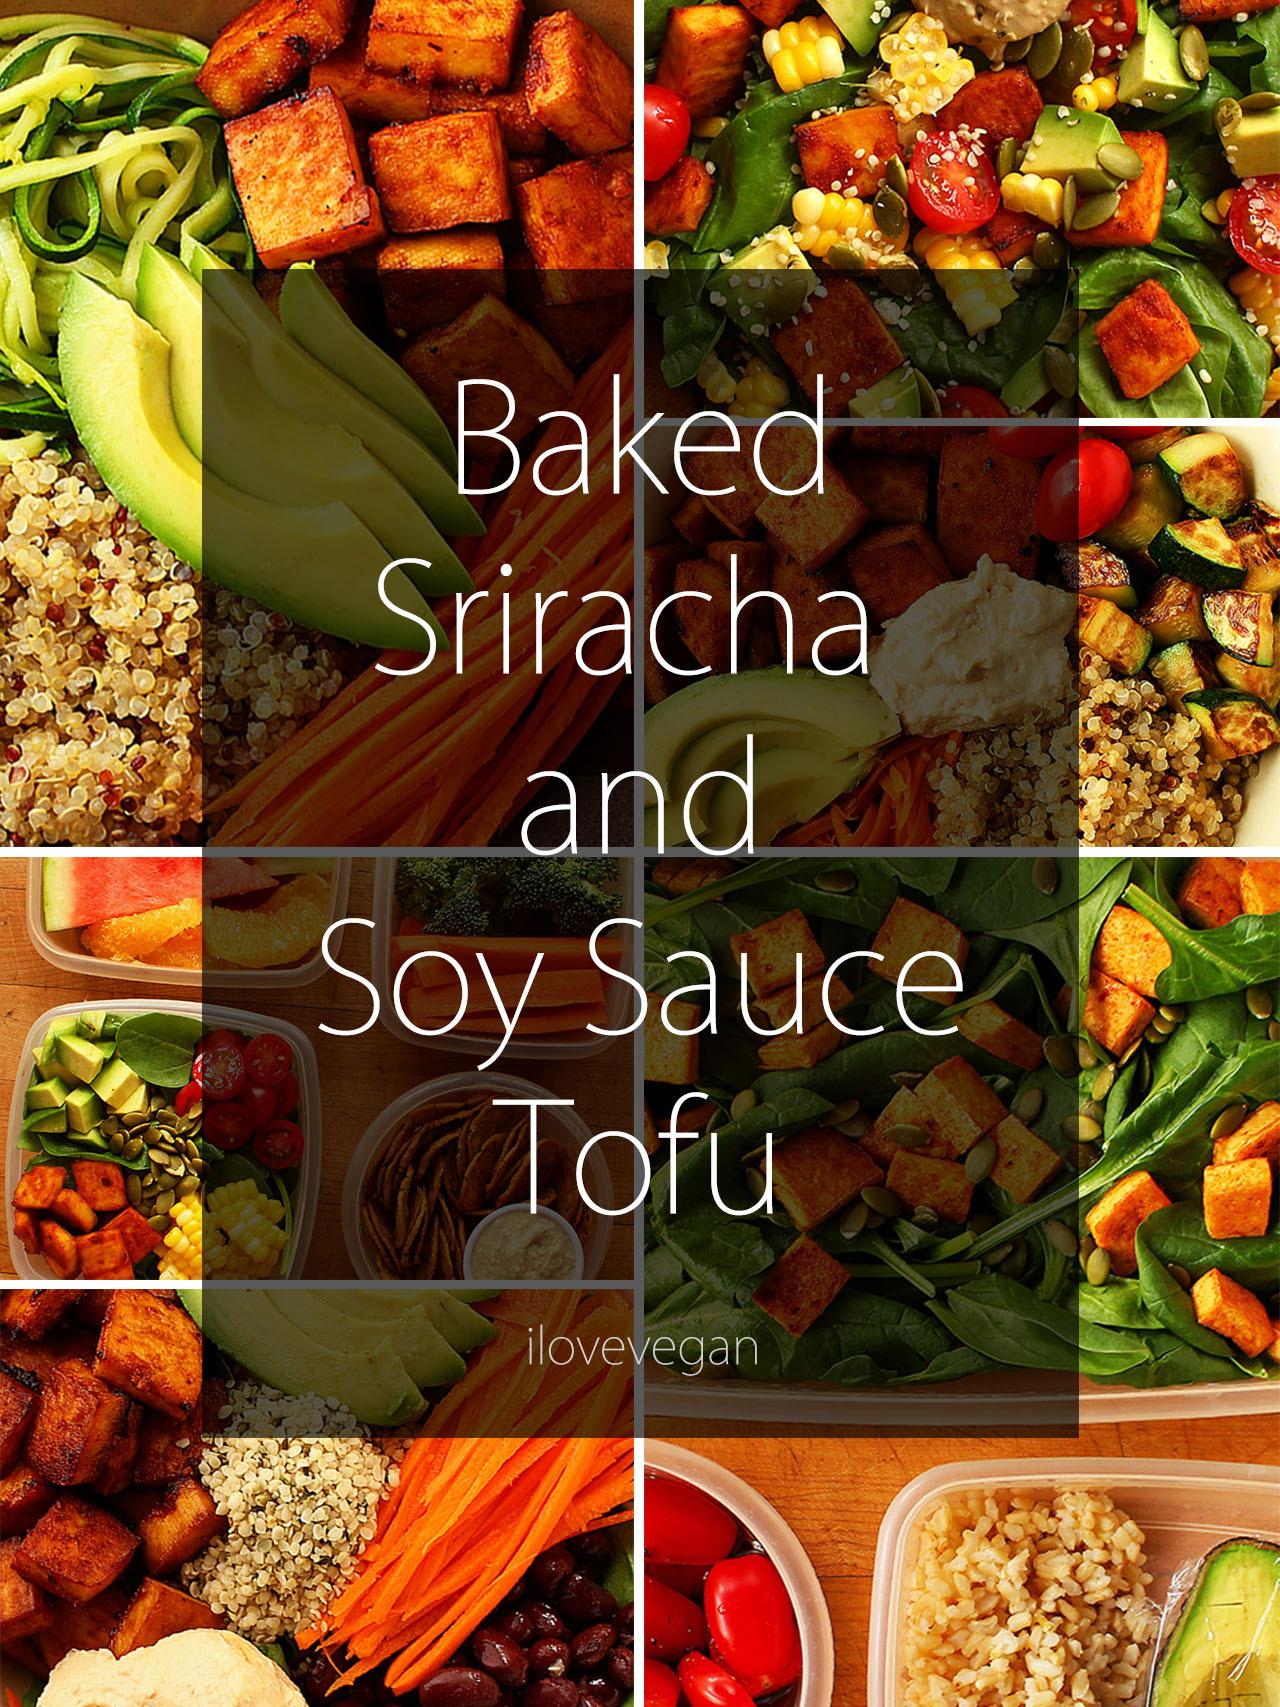 Baked Sriracha and Soy Sauce Tofu + 2 Quick & Easy...   Garden of Vegan